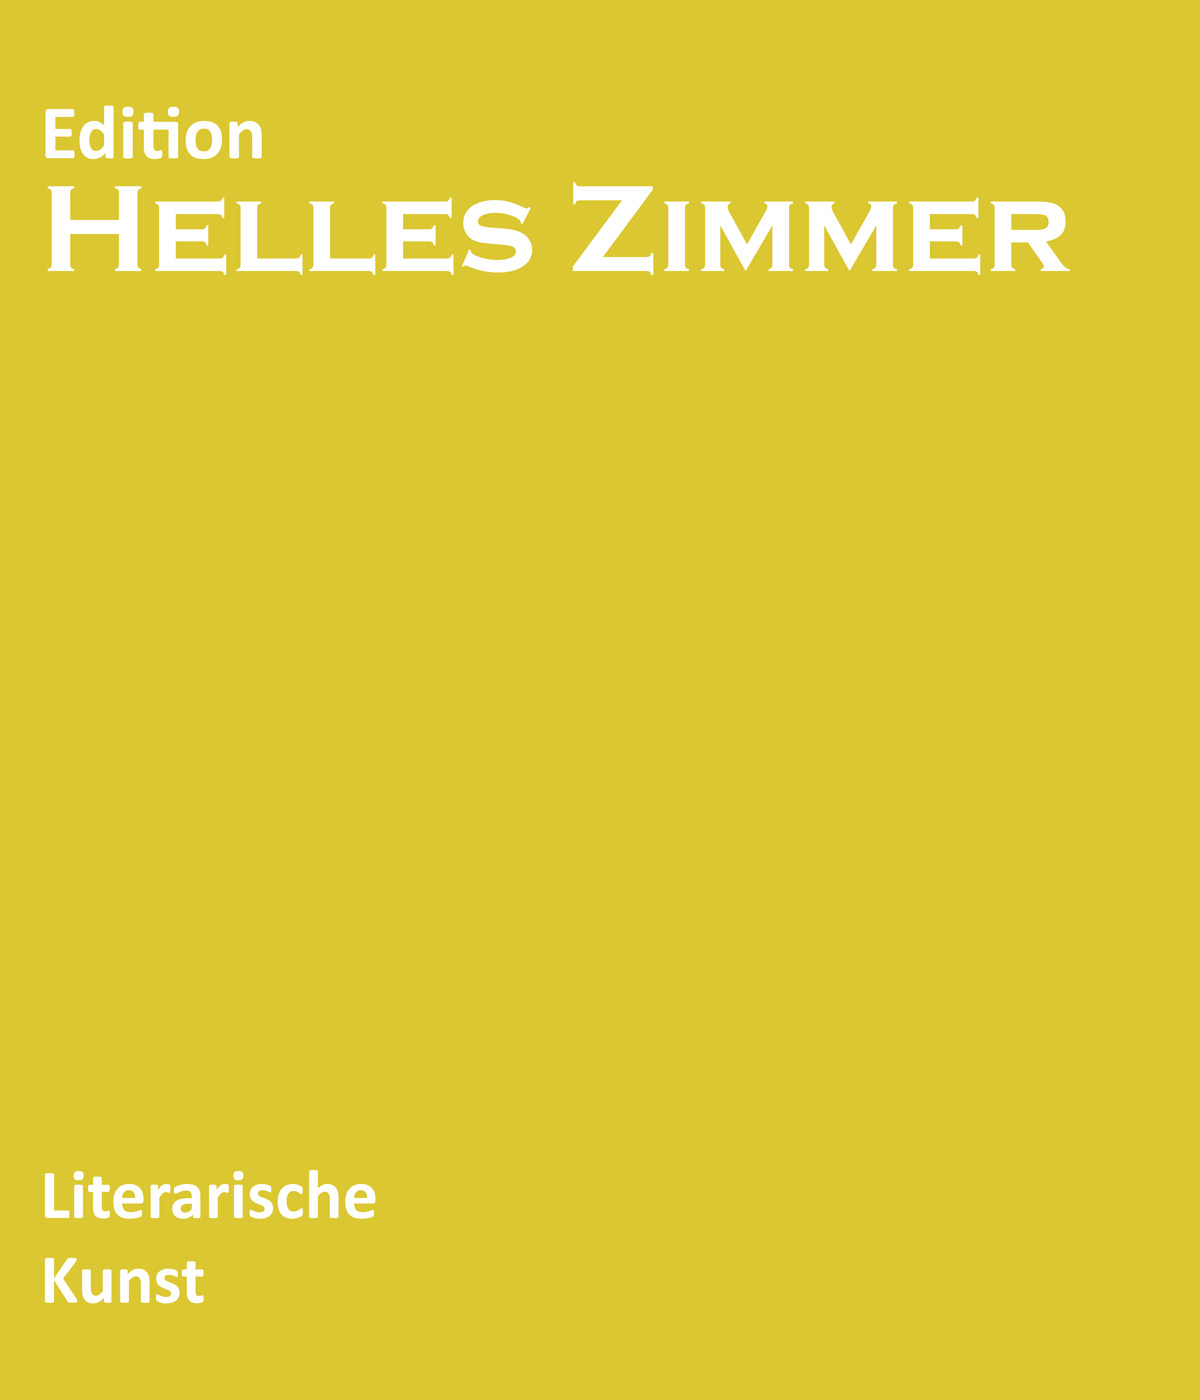 Seh-Sam-Verlag - Edition -HellesZimmer